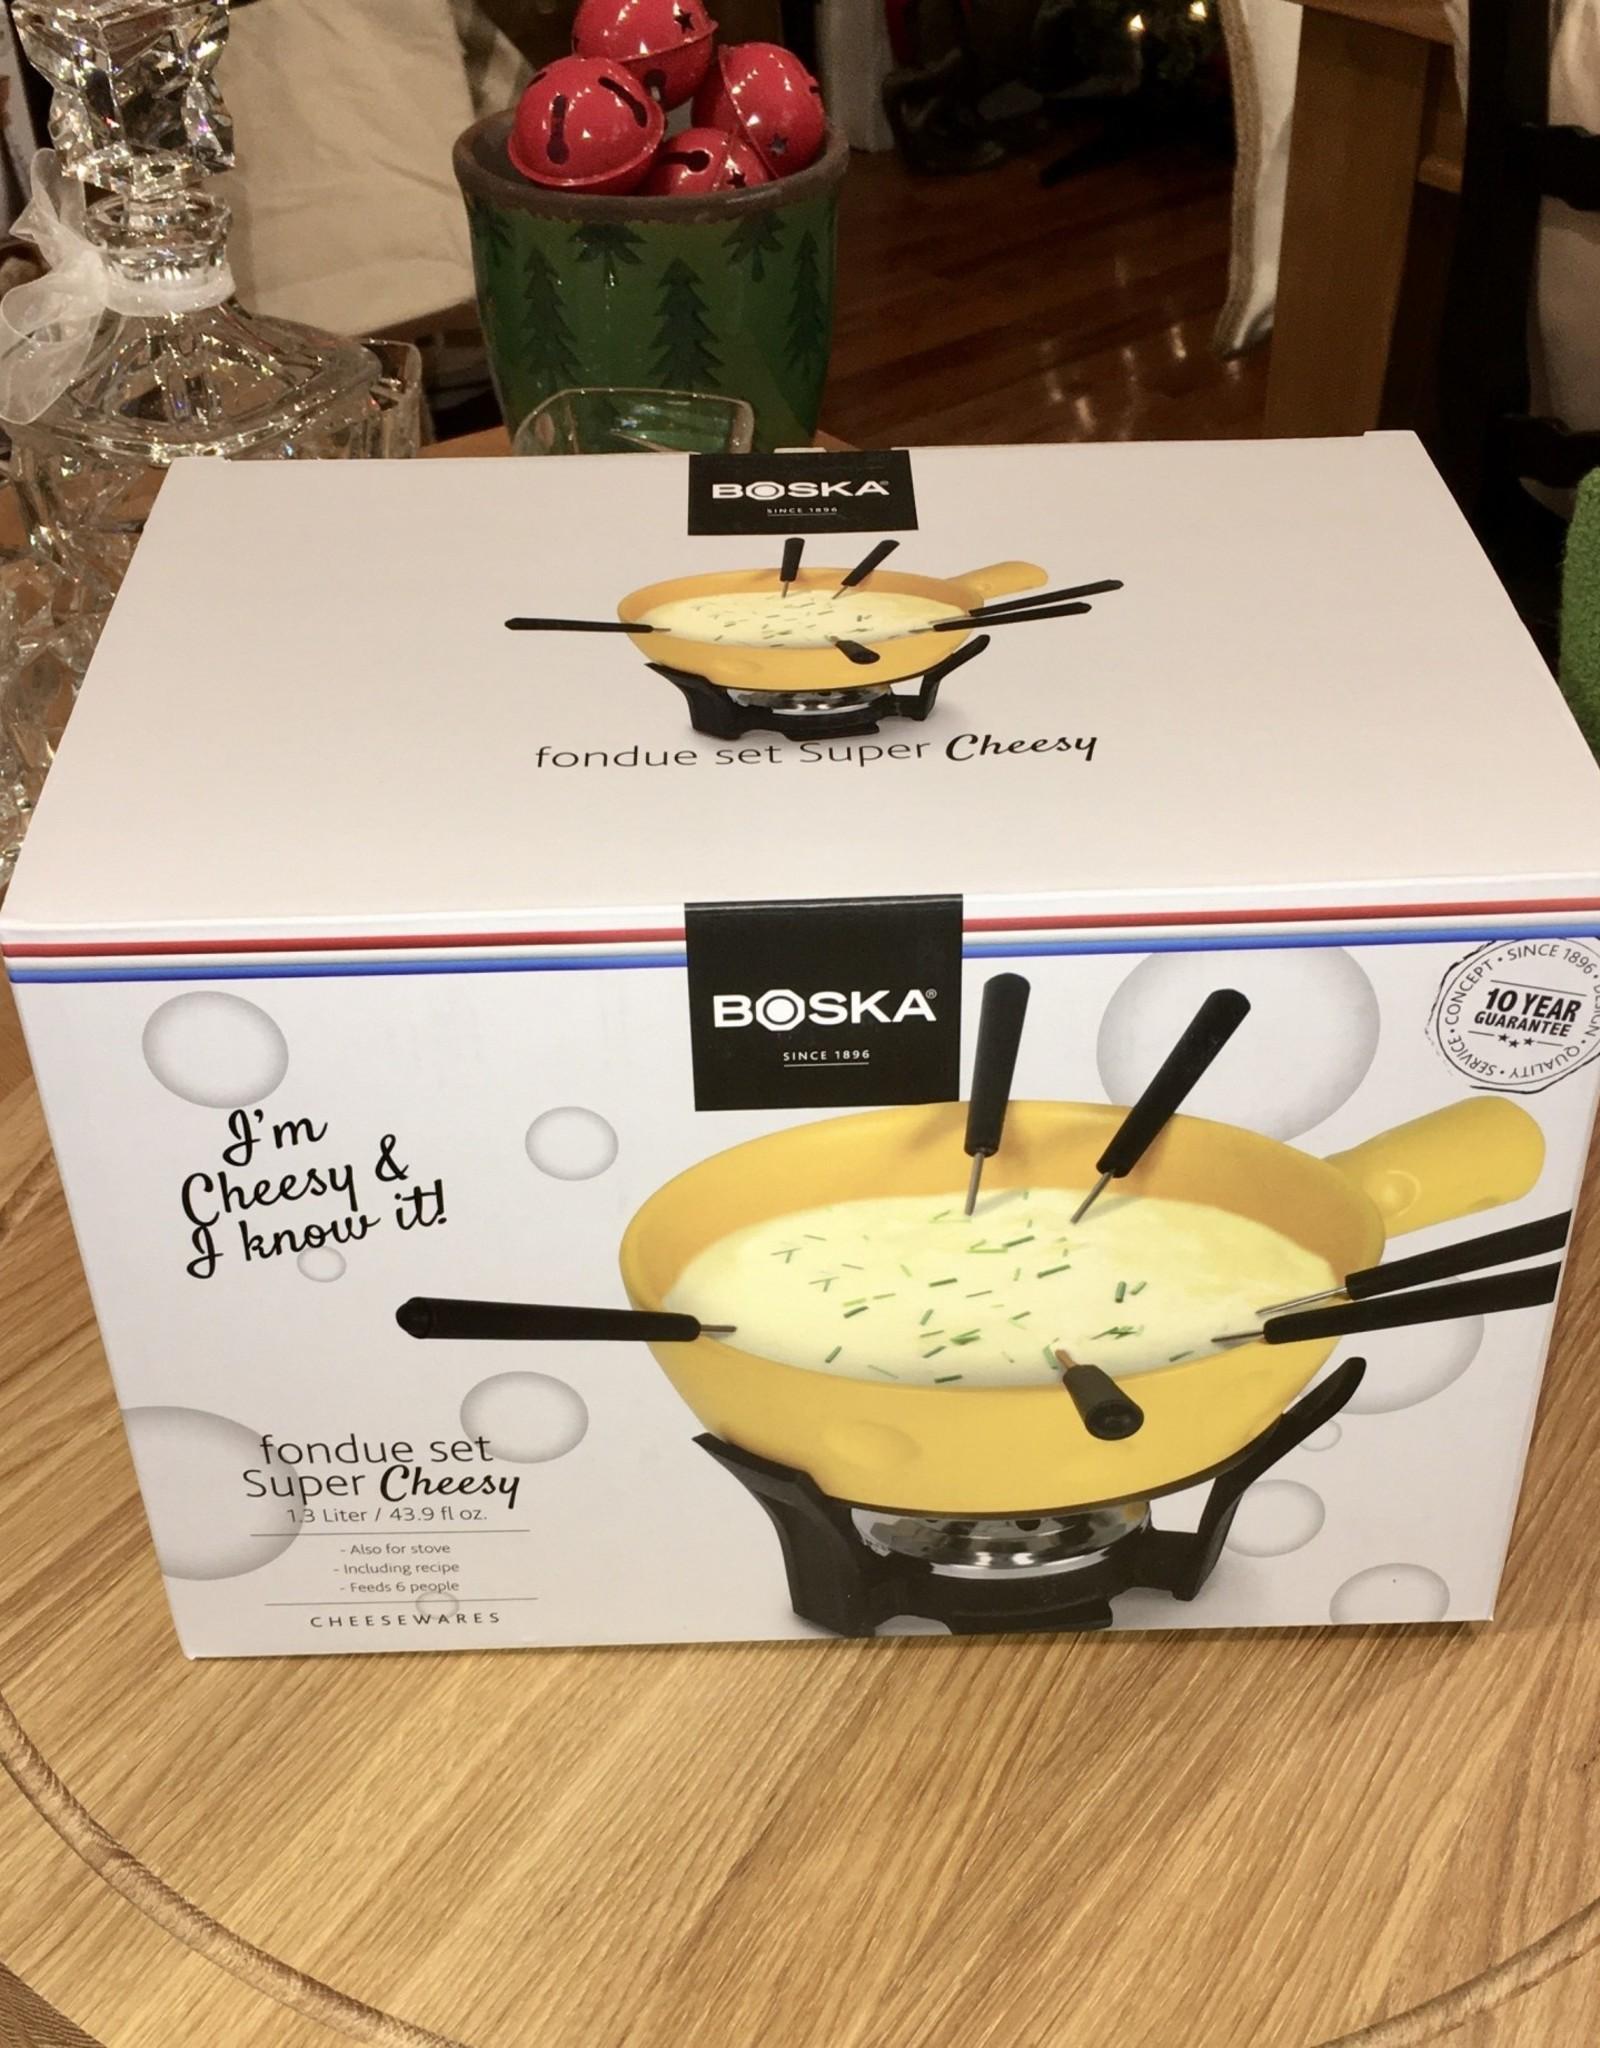 Boska Holland Fondue Set Super Cheesy - 44 fl oz (1.3 L)